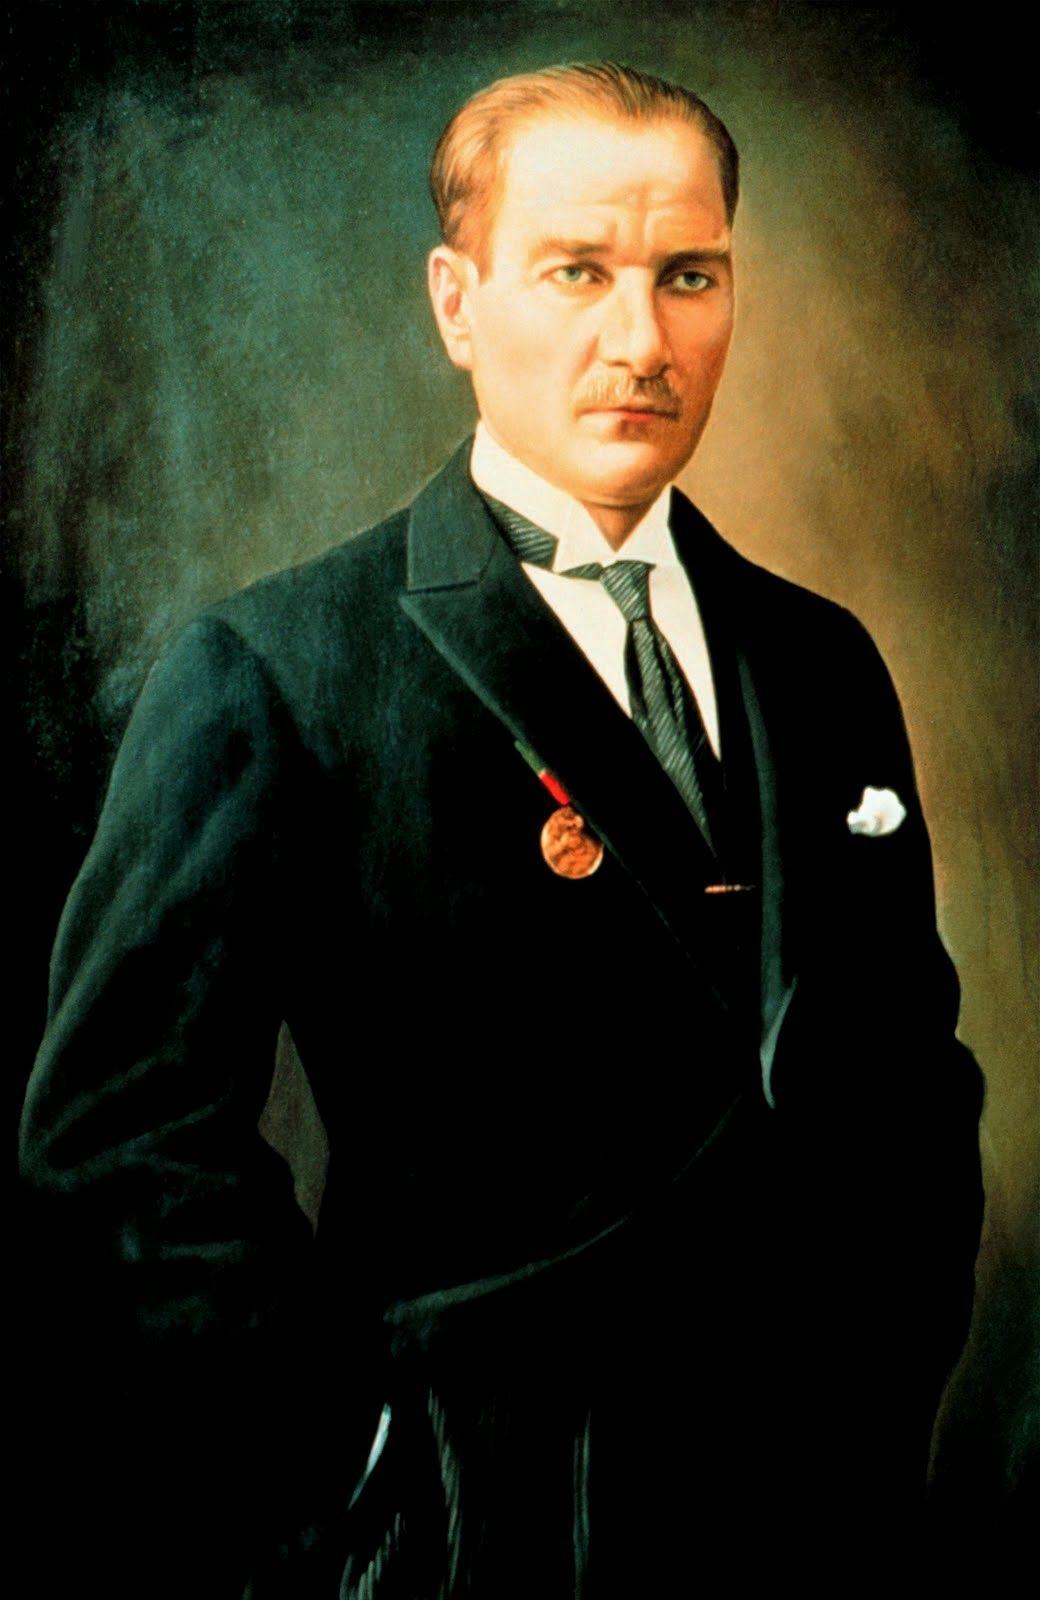 Mustafa Kemal Ataturk Portre Resimleri Ataturk Un Buyuk Boy Fotograflari Renkli Ataturk Portre Resimleri Forumgazel Den Ataturk Fotograf Portre Fotograf Resim